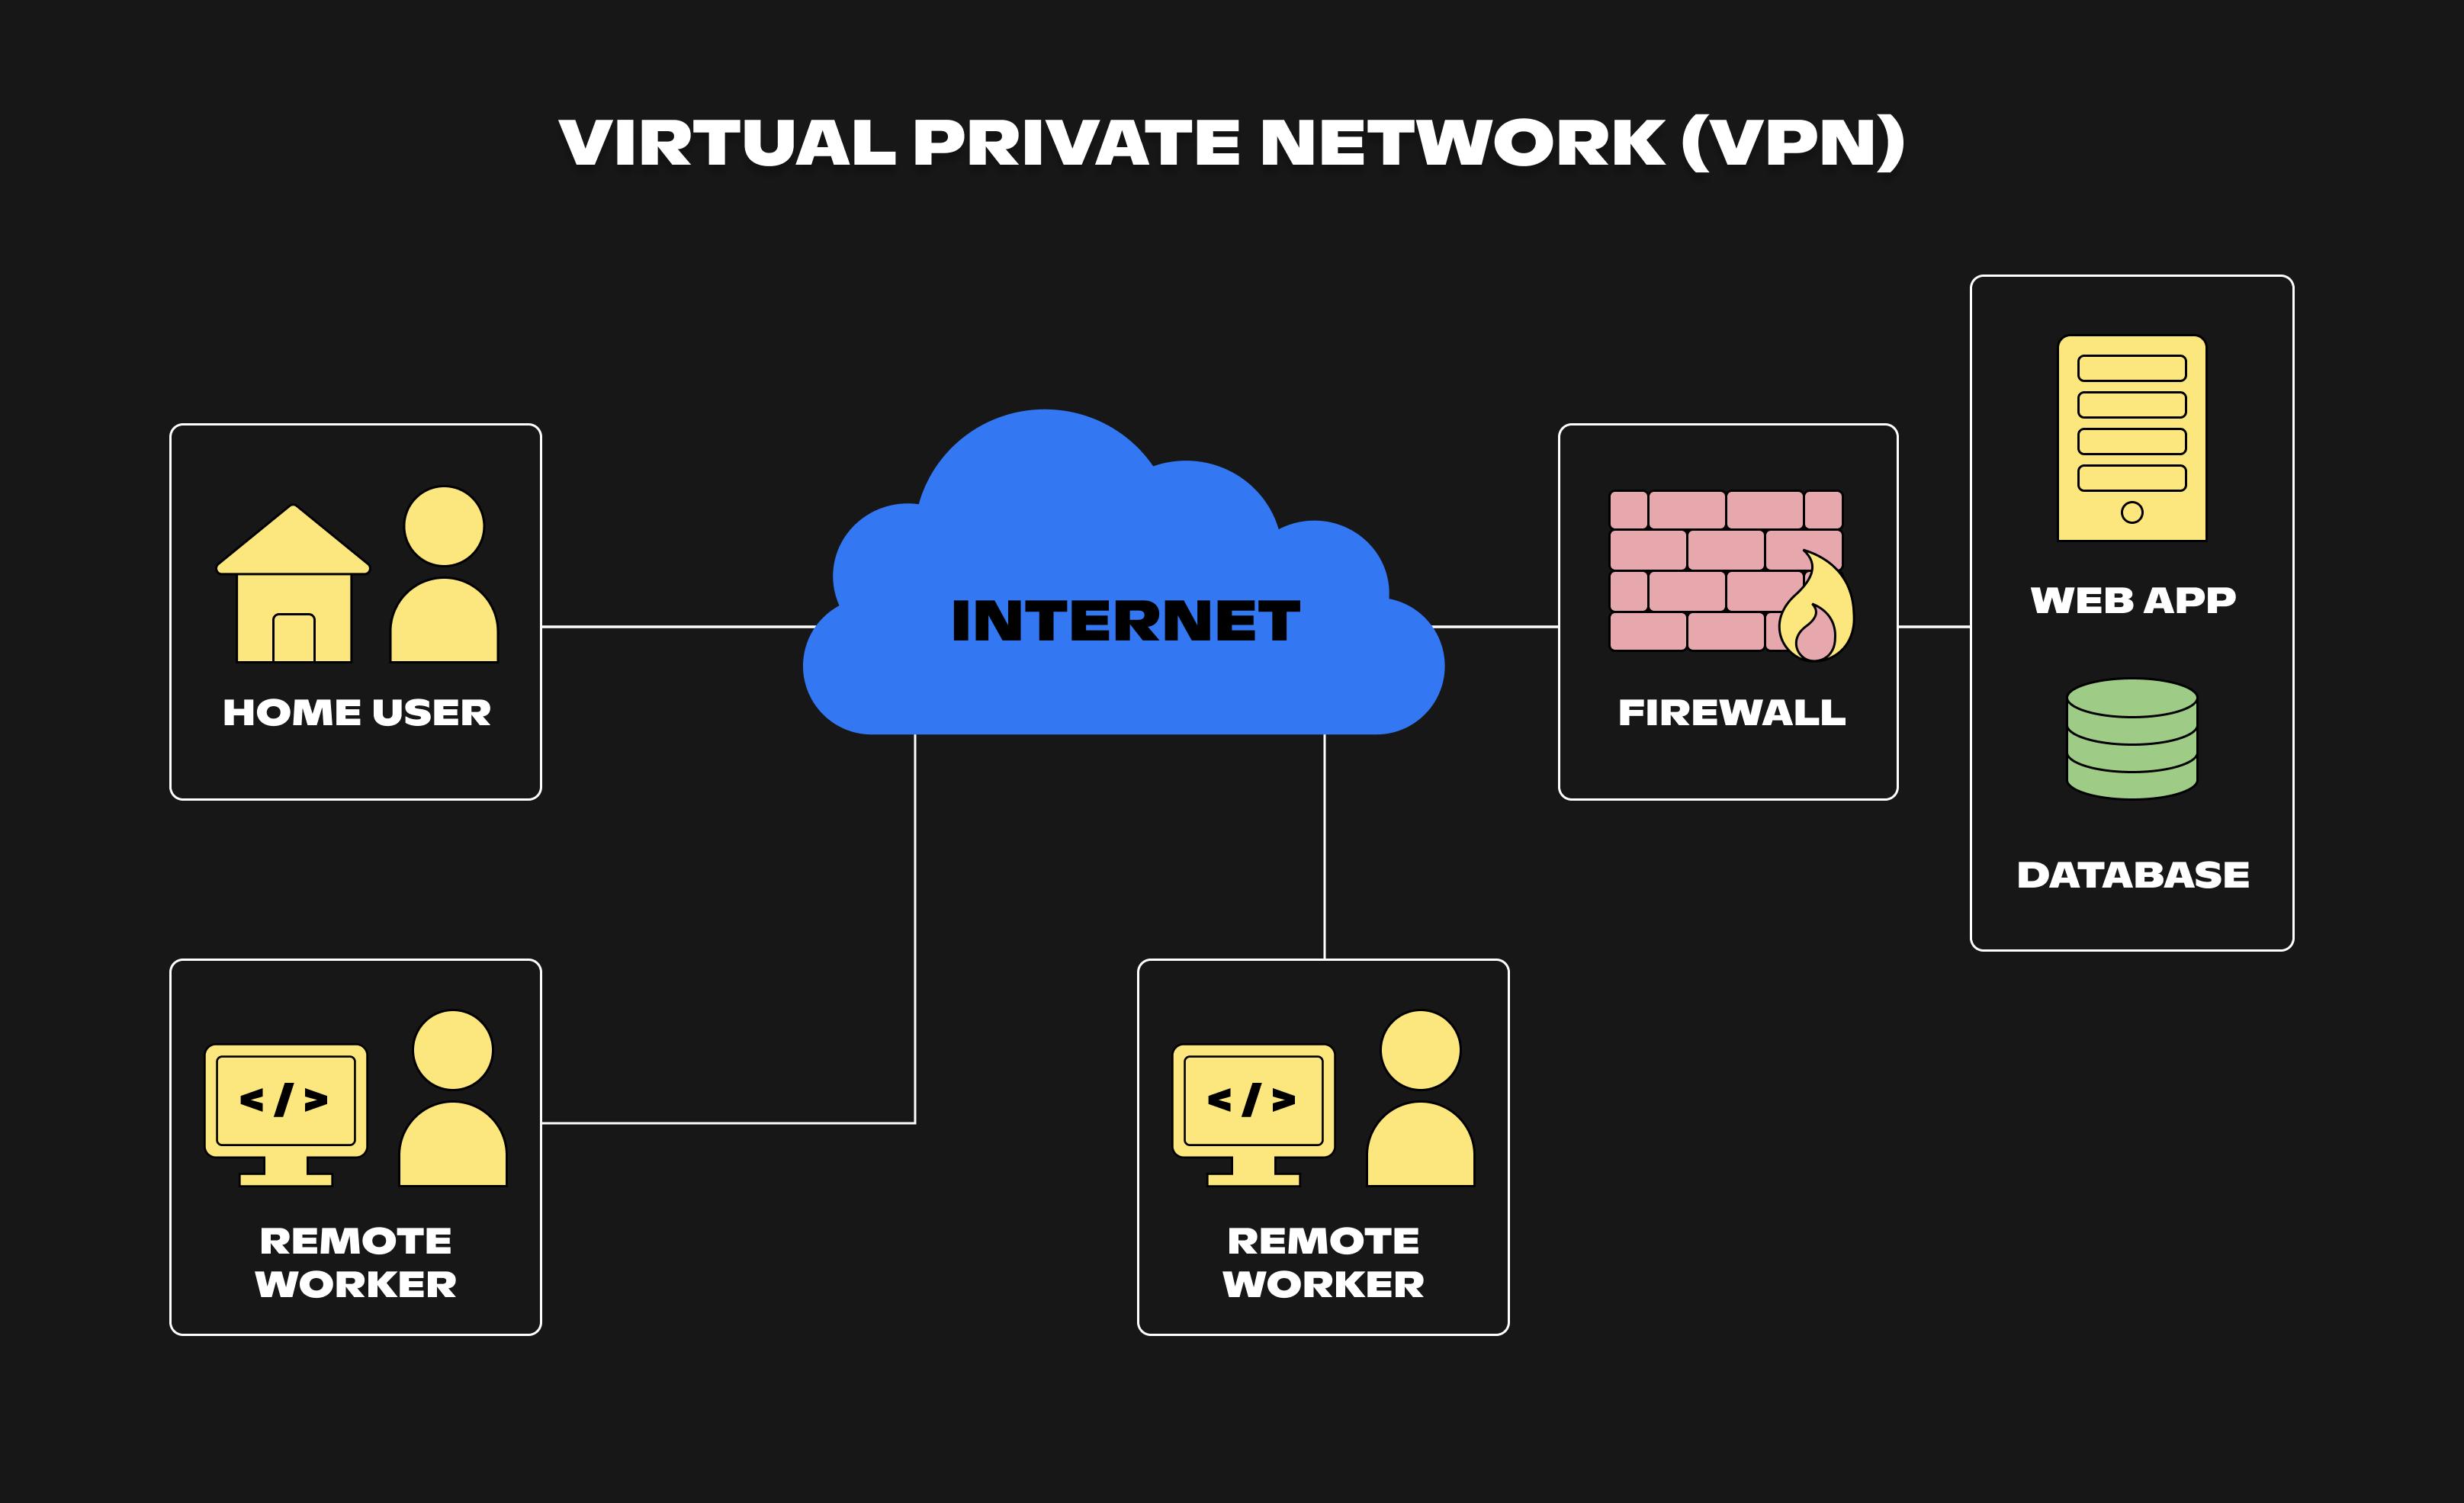 A common modern VPN diagram